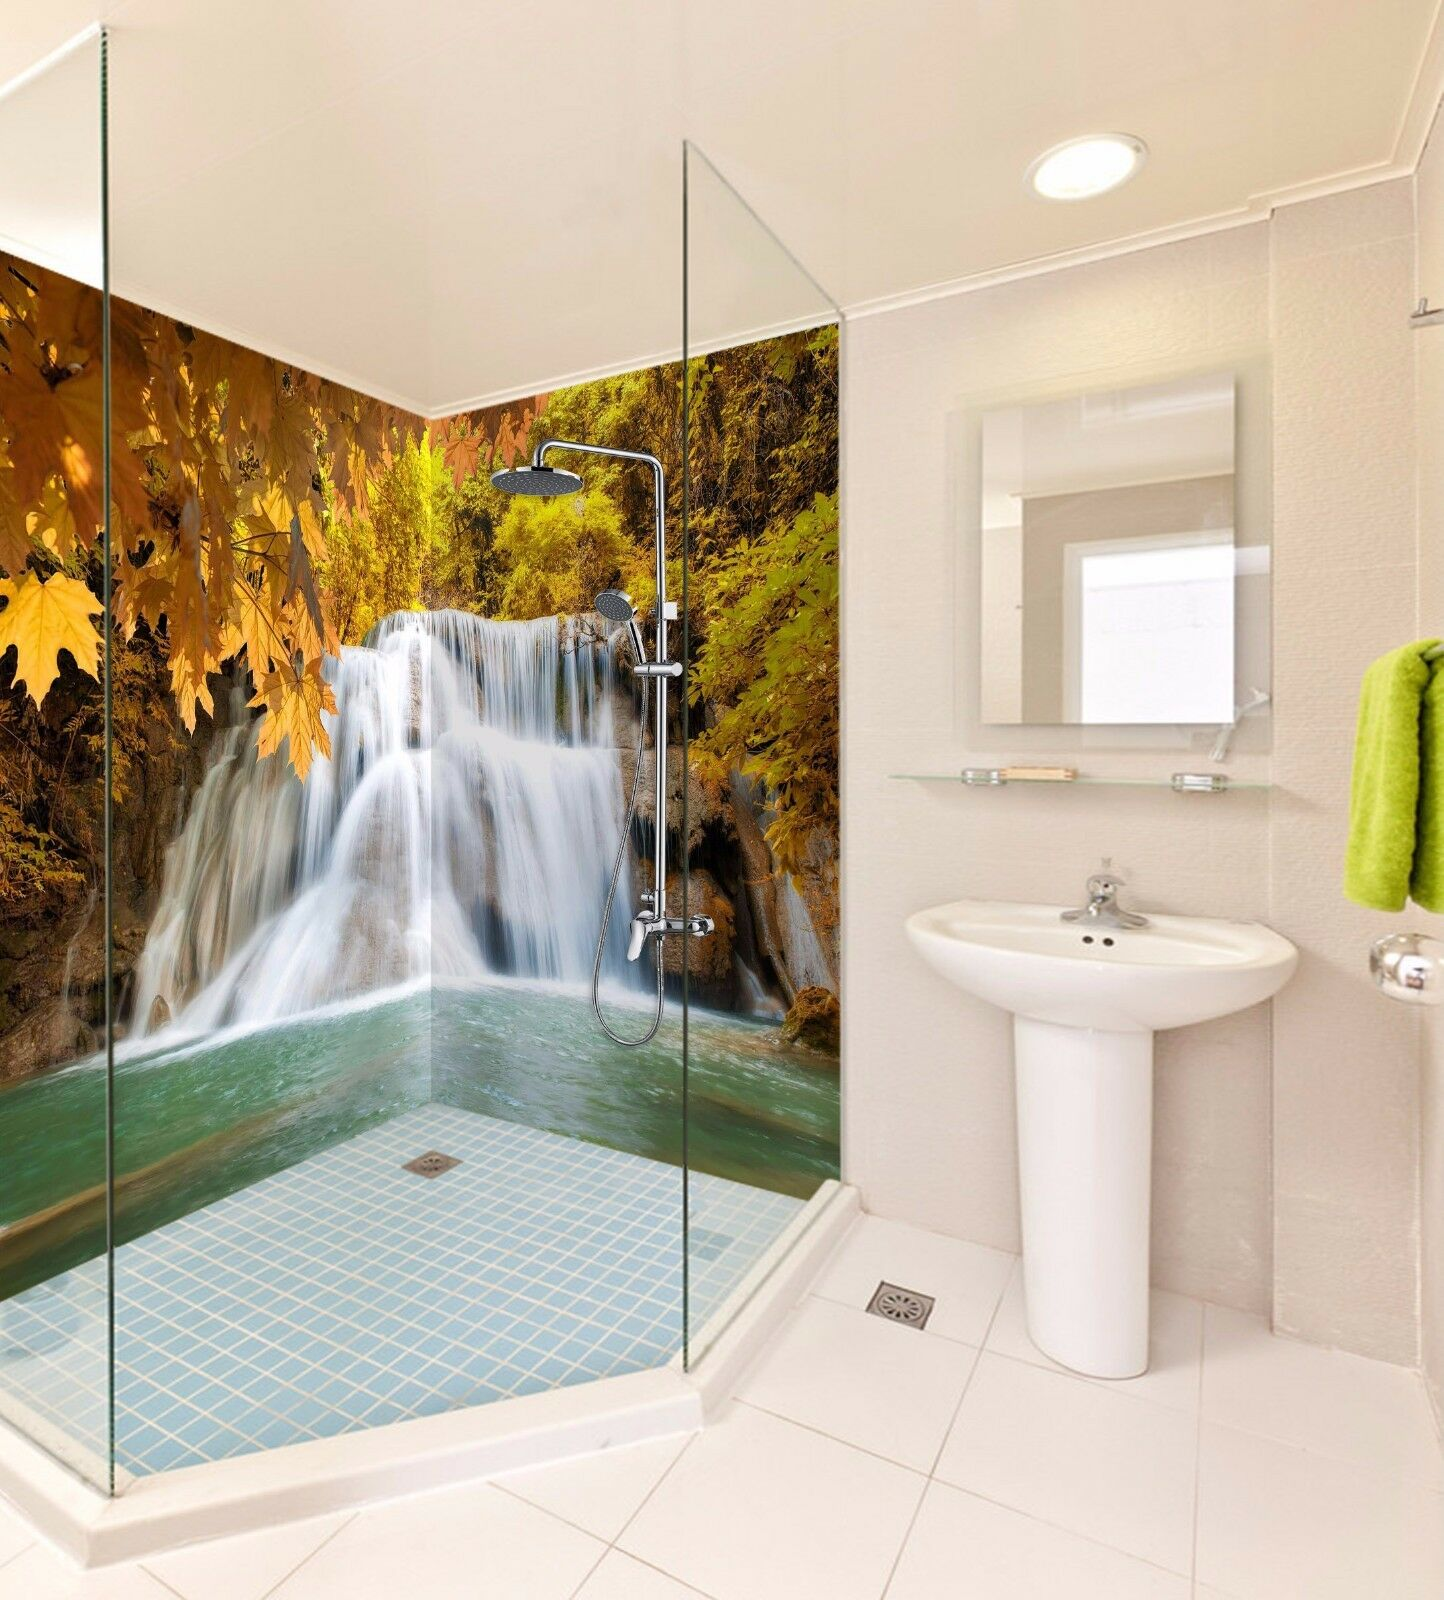 3D Waterfall Maple 555 WallPaper Bathroom Print Decal Wall Deco AJ WALLPAPER AU